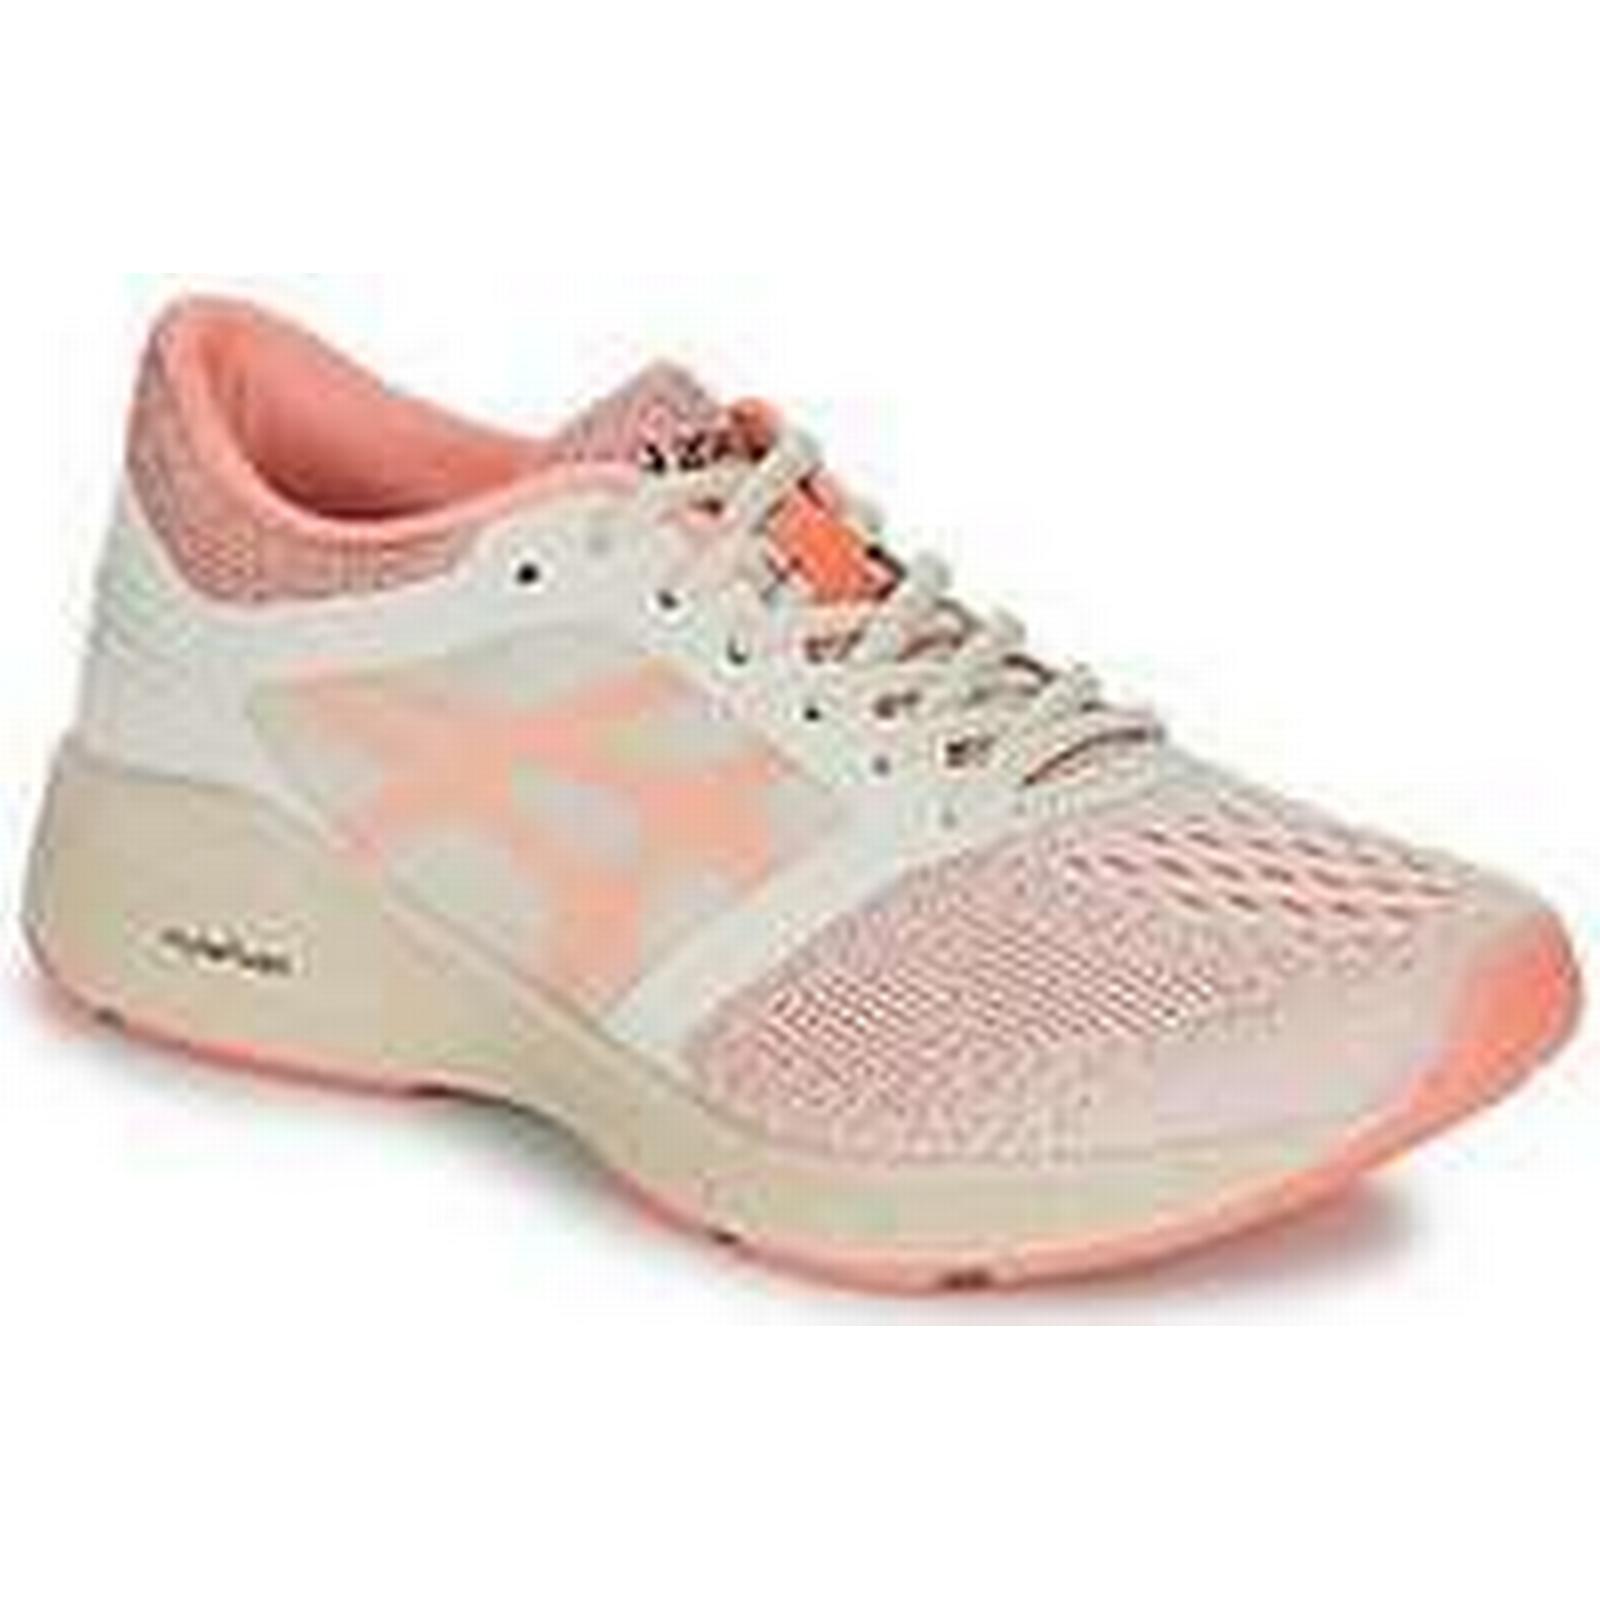 Spartoo.co.uk Asics ROADHAWK Trainers women's Running Trainers ROADHAWK in Beige 208d1f